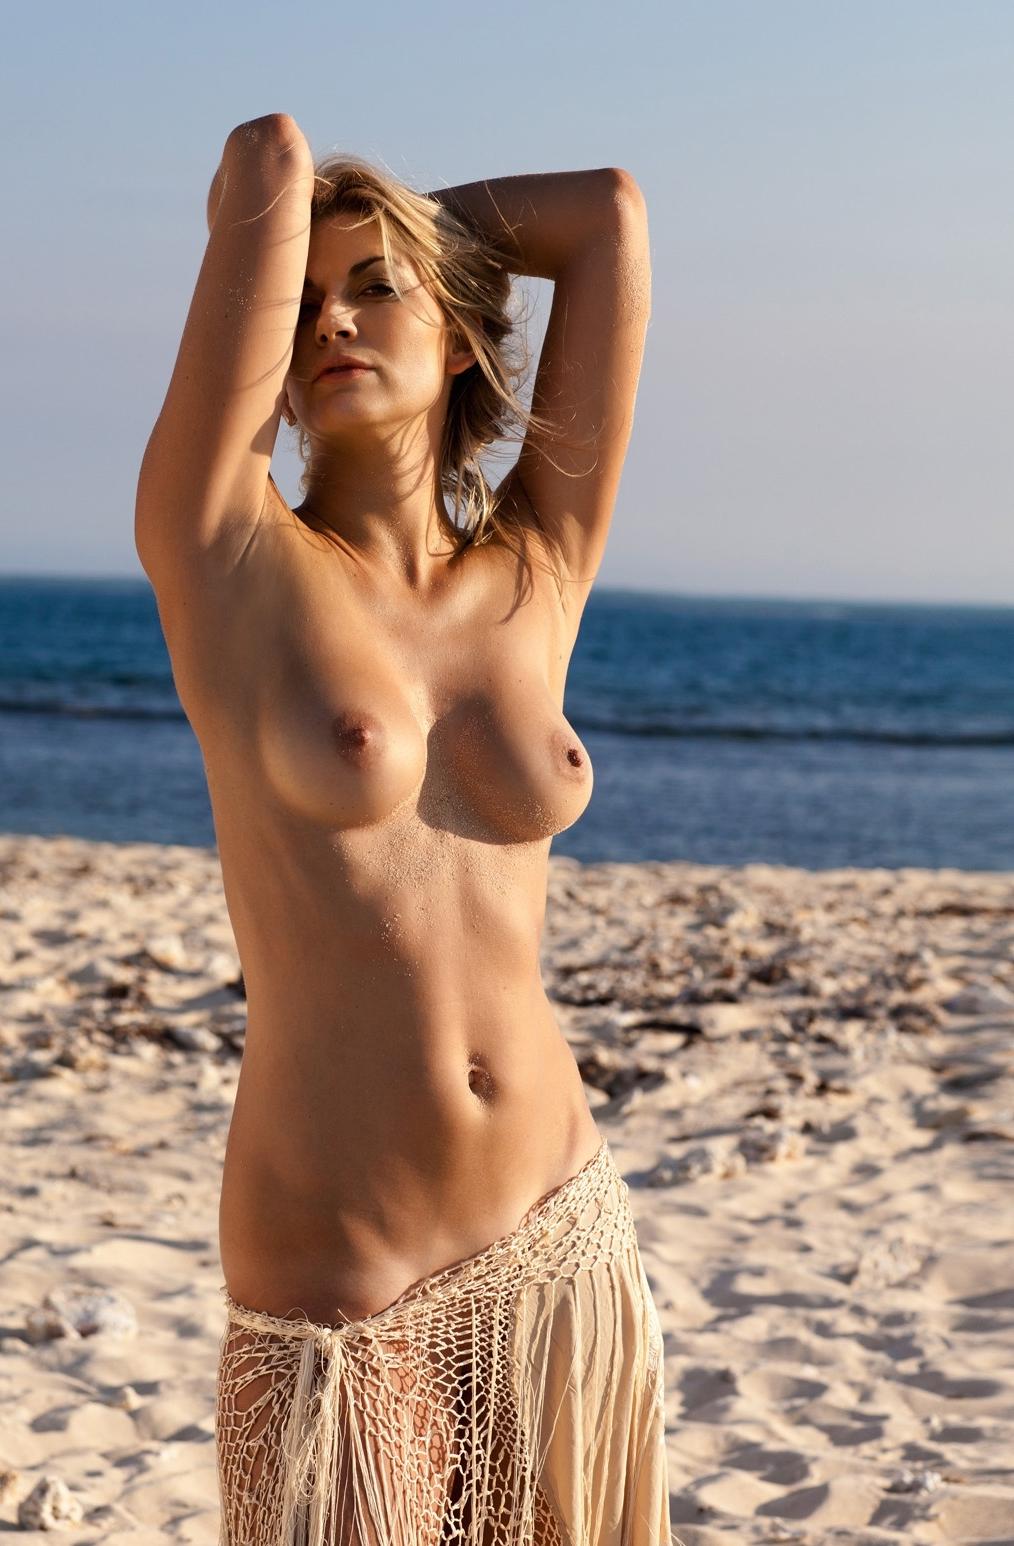 Russian hot sex women picture